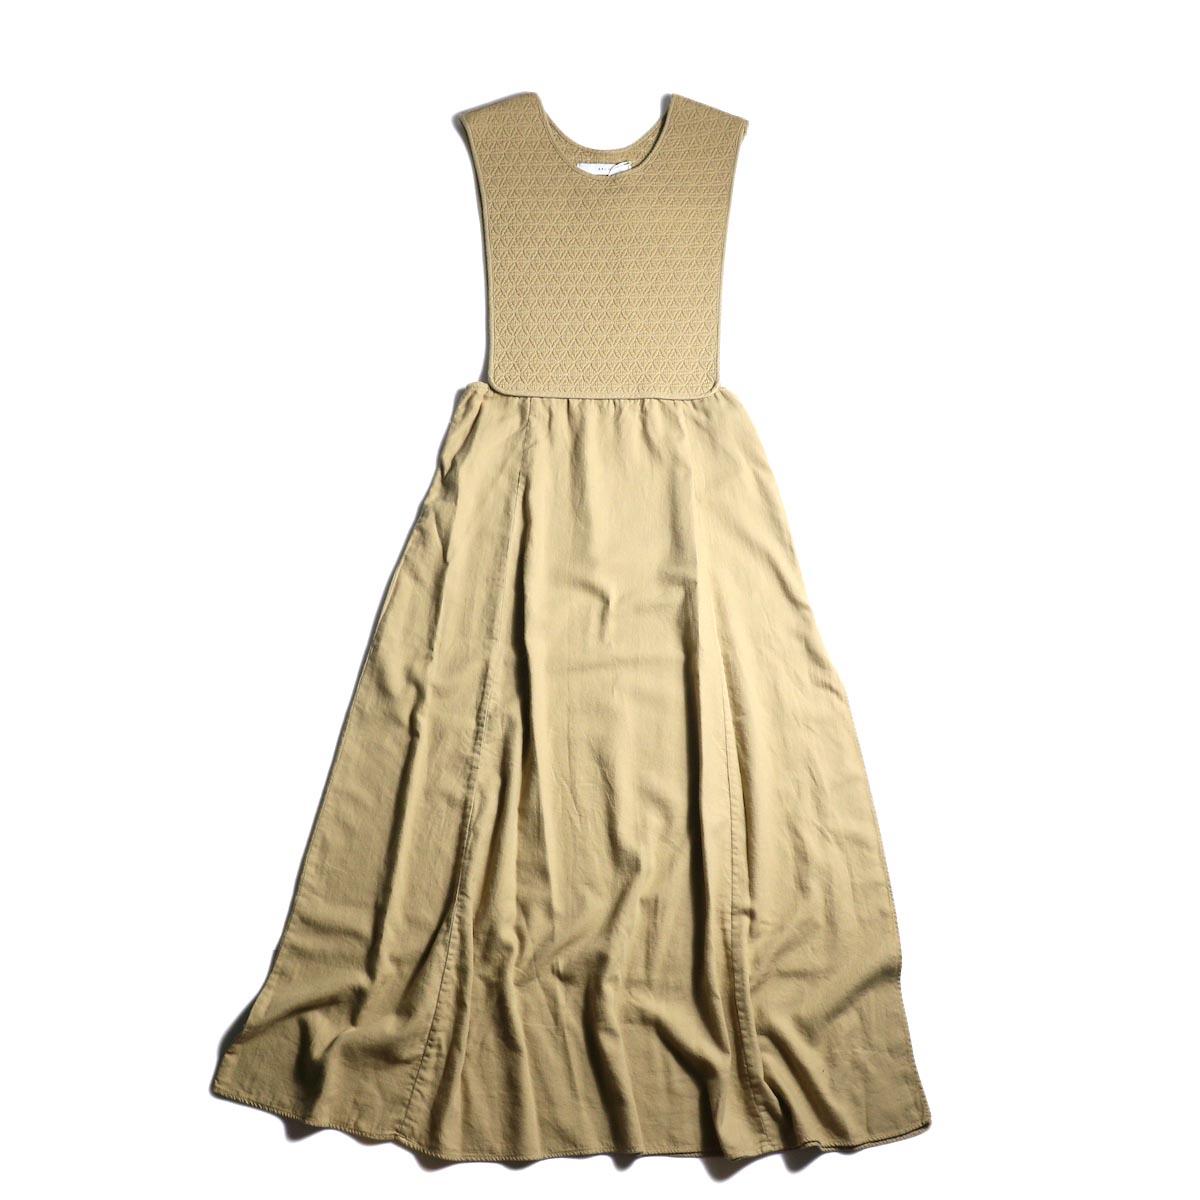 ARCHI / SKIMIA QUILT DRESS (beige) 正面